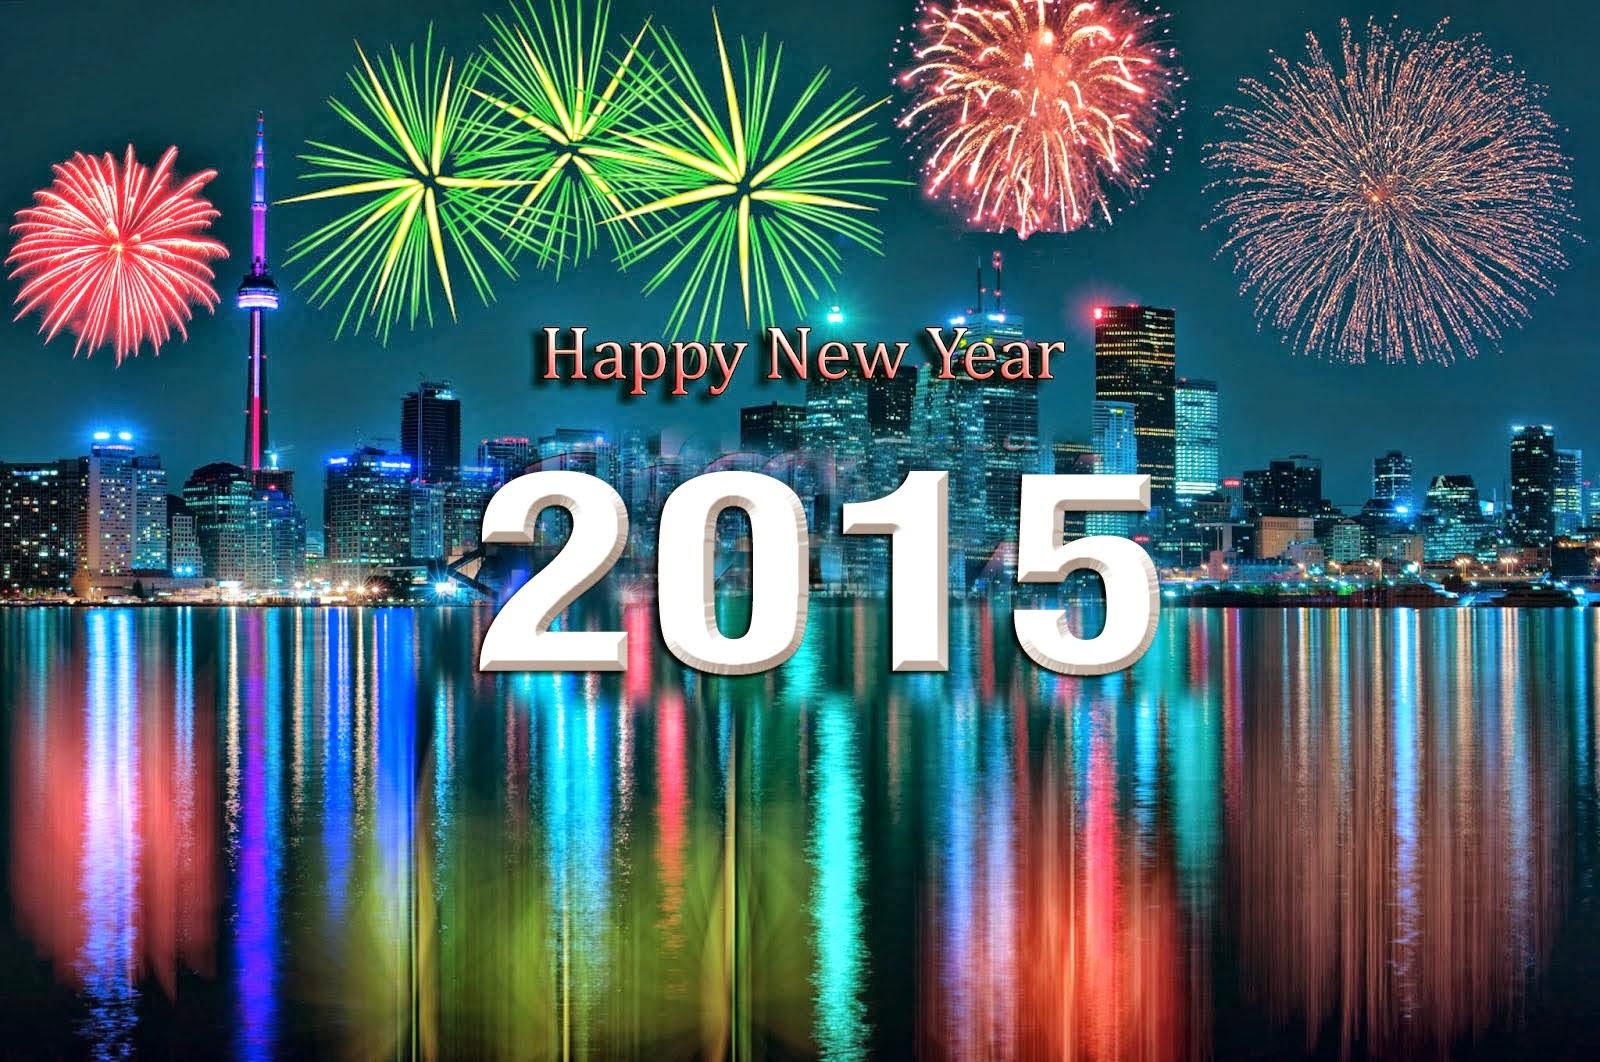 Happy New Year 2015 Wallpaper 3D - happy new year 2015 wallpaper hd - happy new year 2015 wallpaper hd download